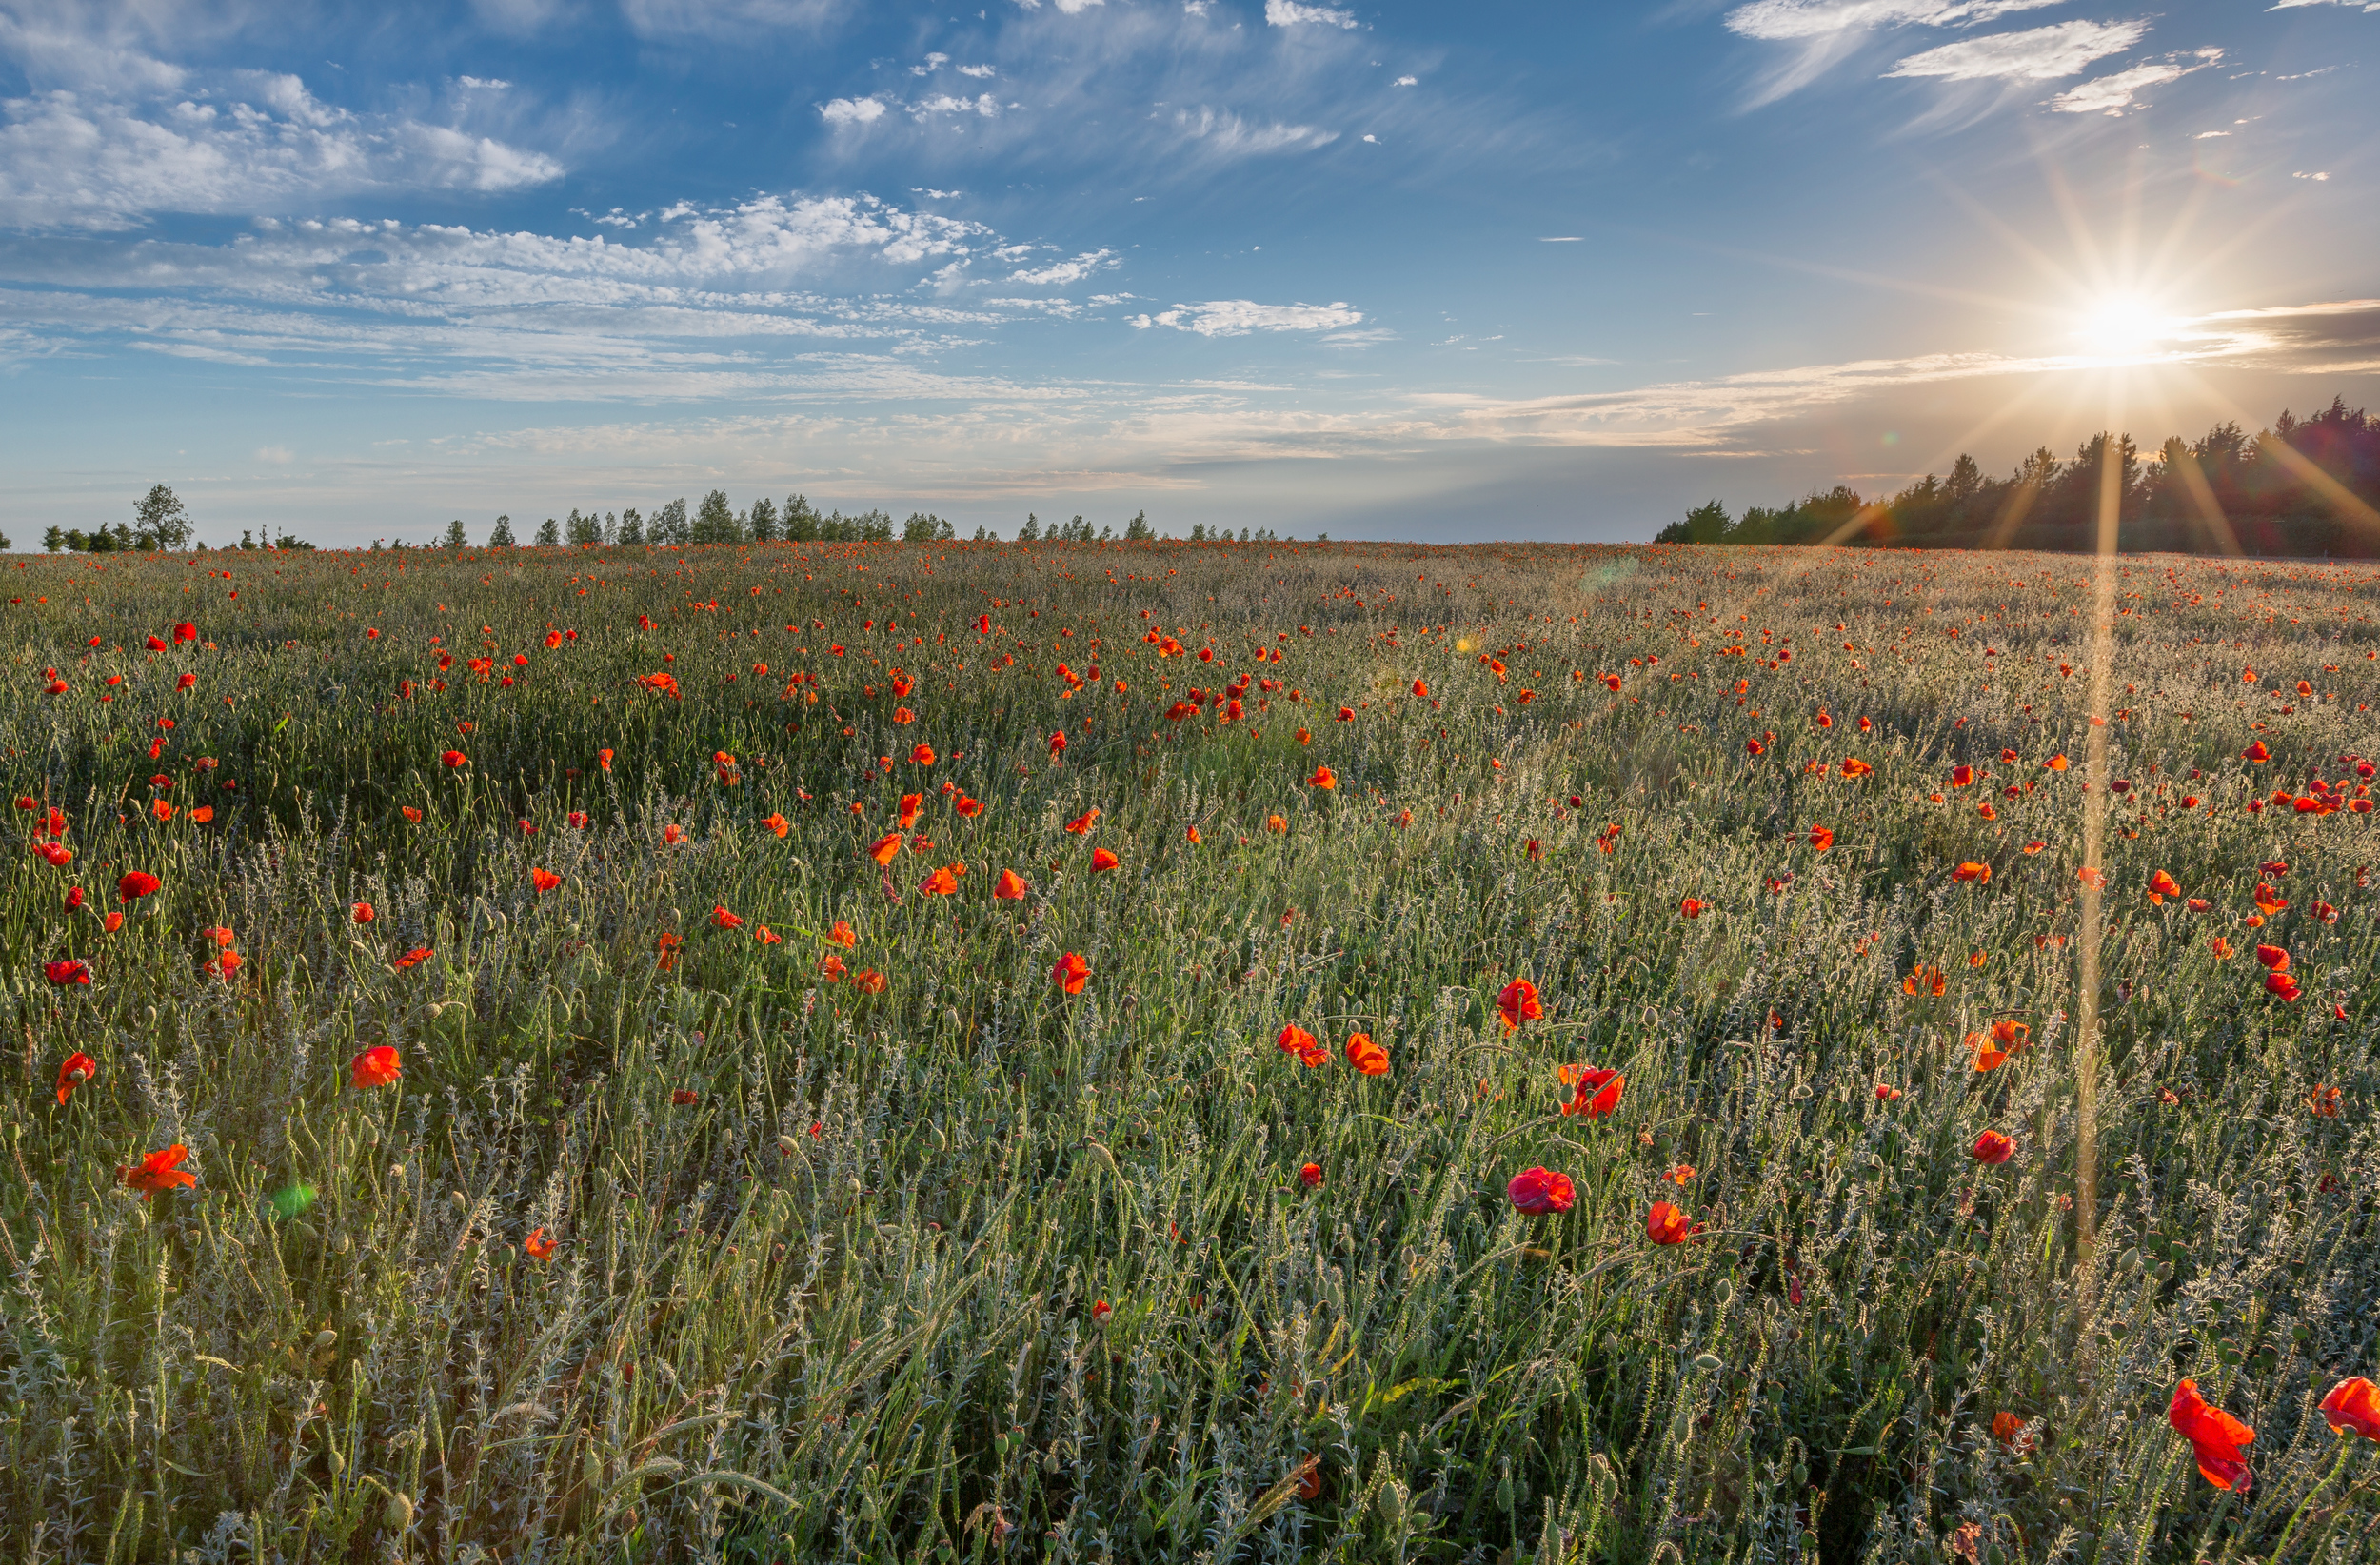 Poppy field in North Hertfordshire